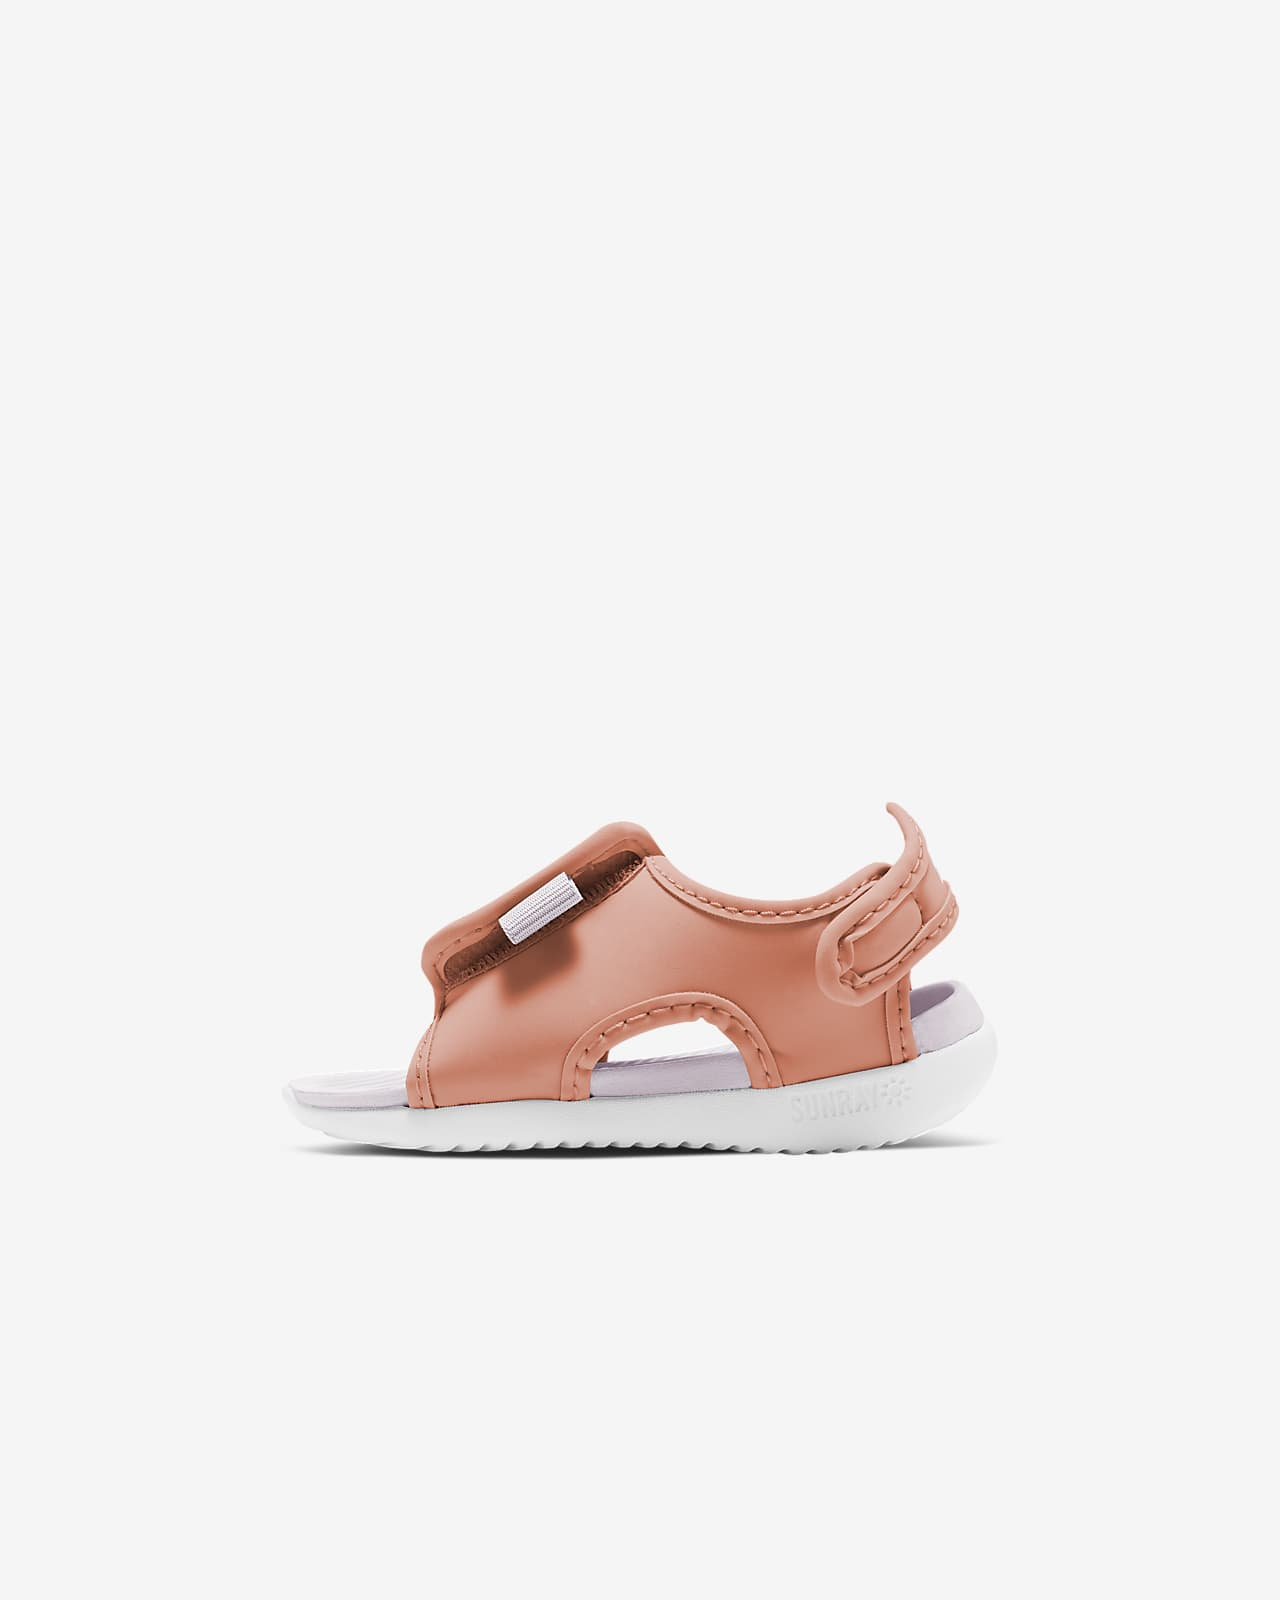 Nike Sunray Adjust 5 V2 Baby/Toddler Sandal